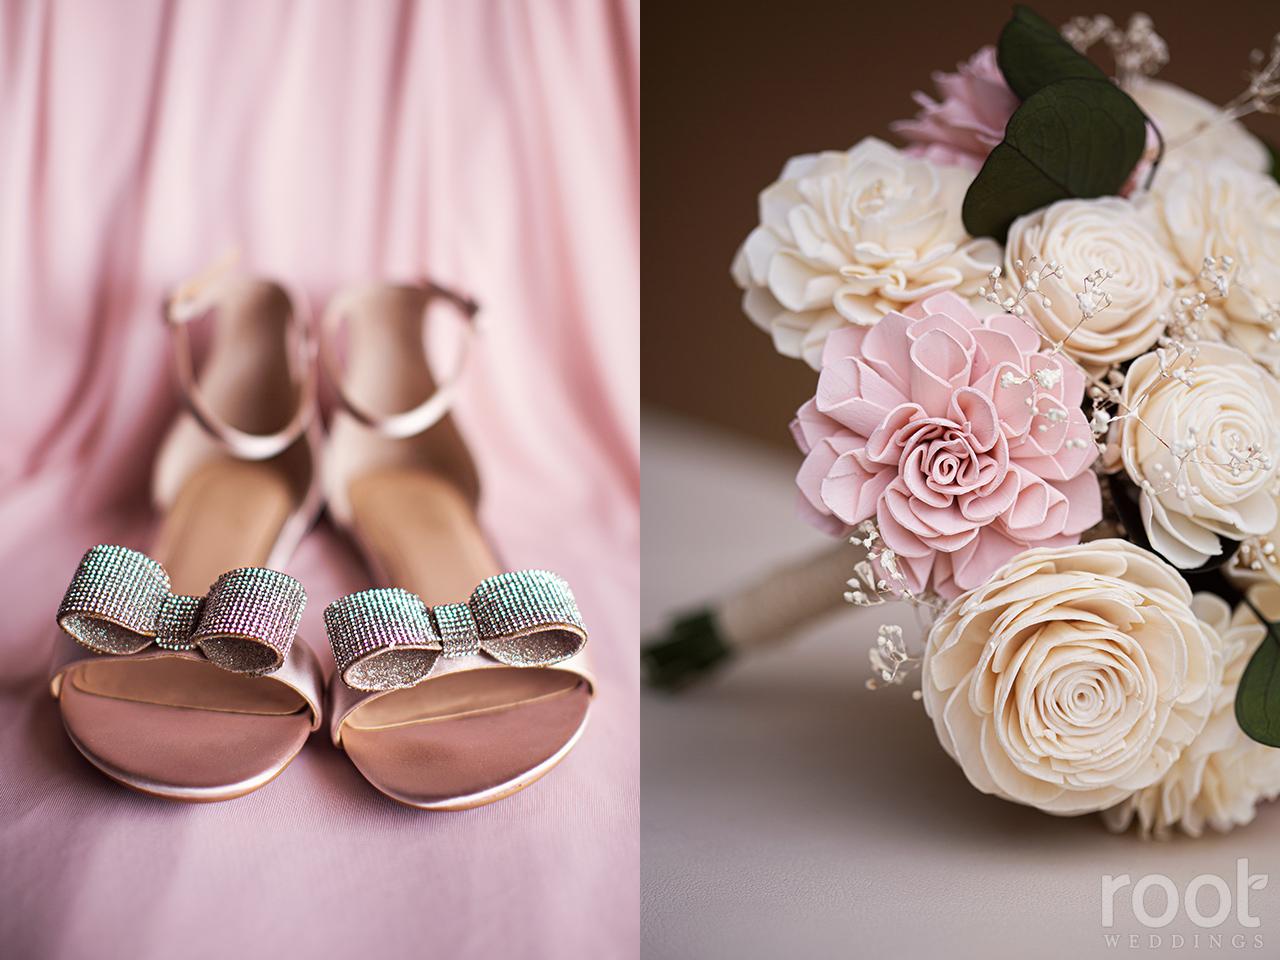 Blush pink bridesmaid dress and silver bow shoes